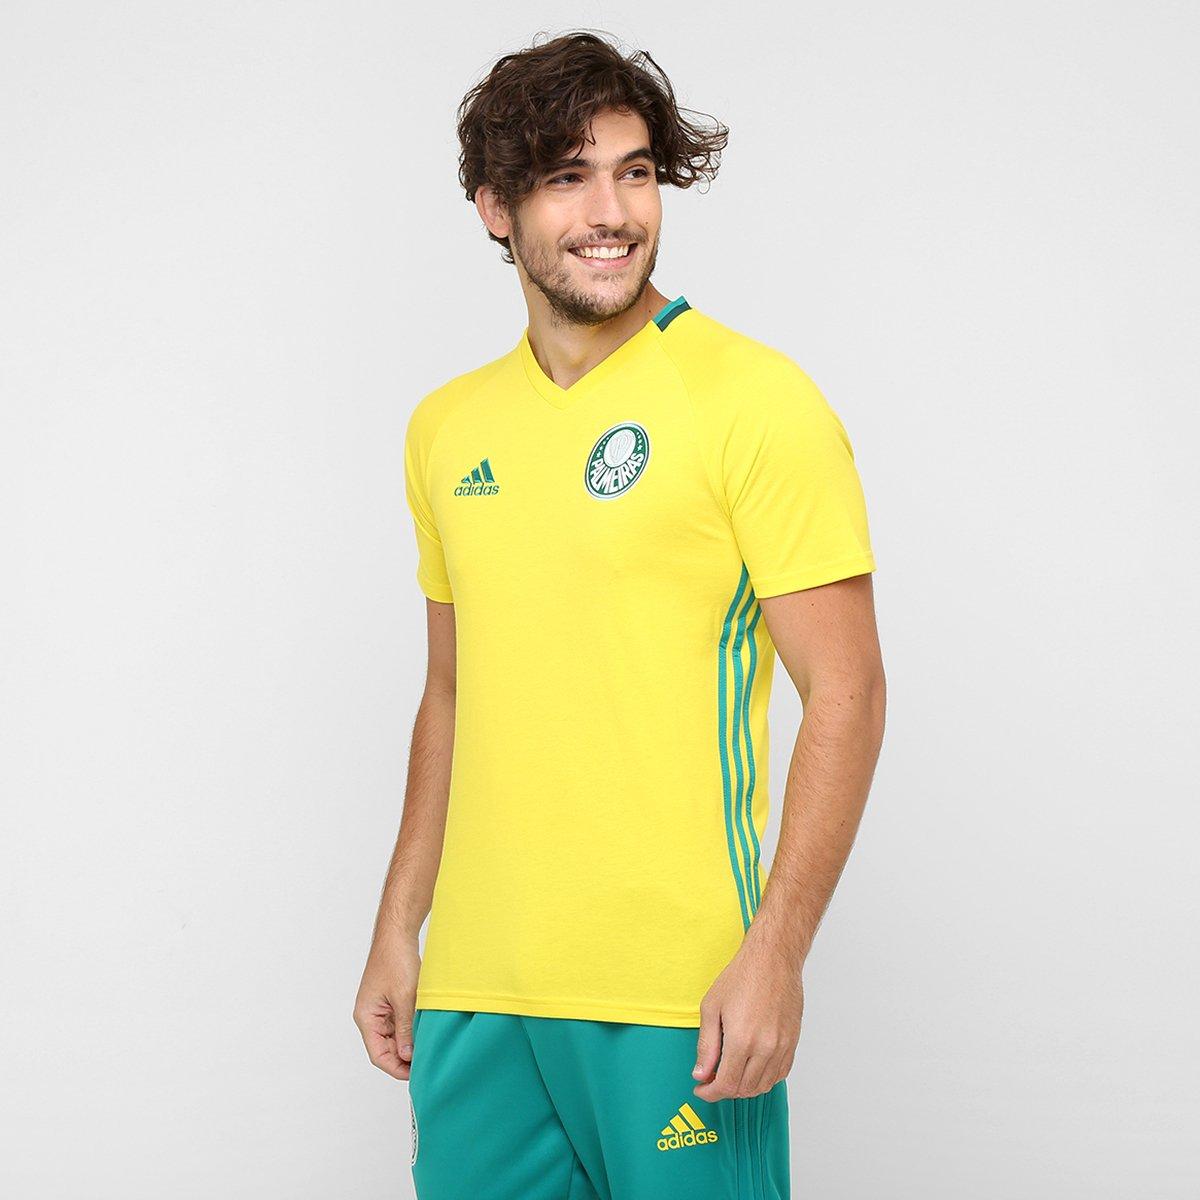 8efba6f3adb4f Camisa Adidas Palmeiras Viagem | Netshoes